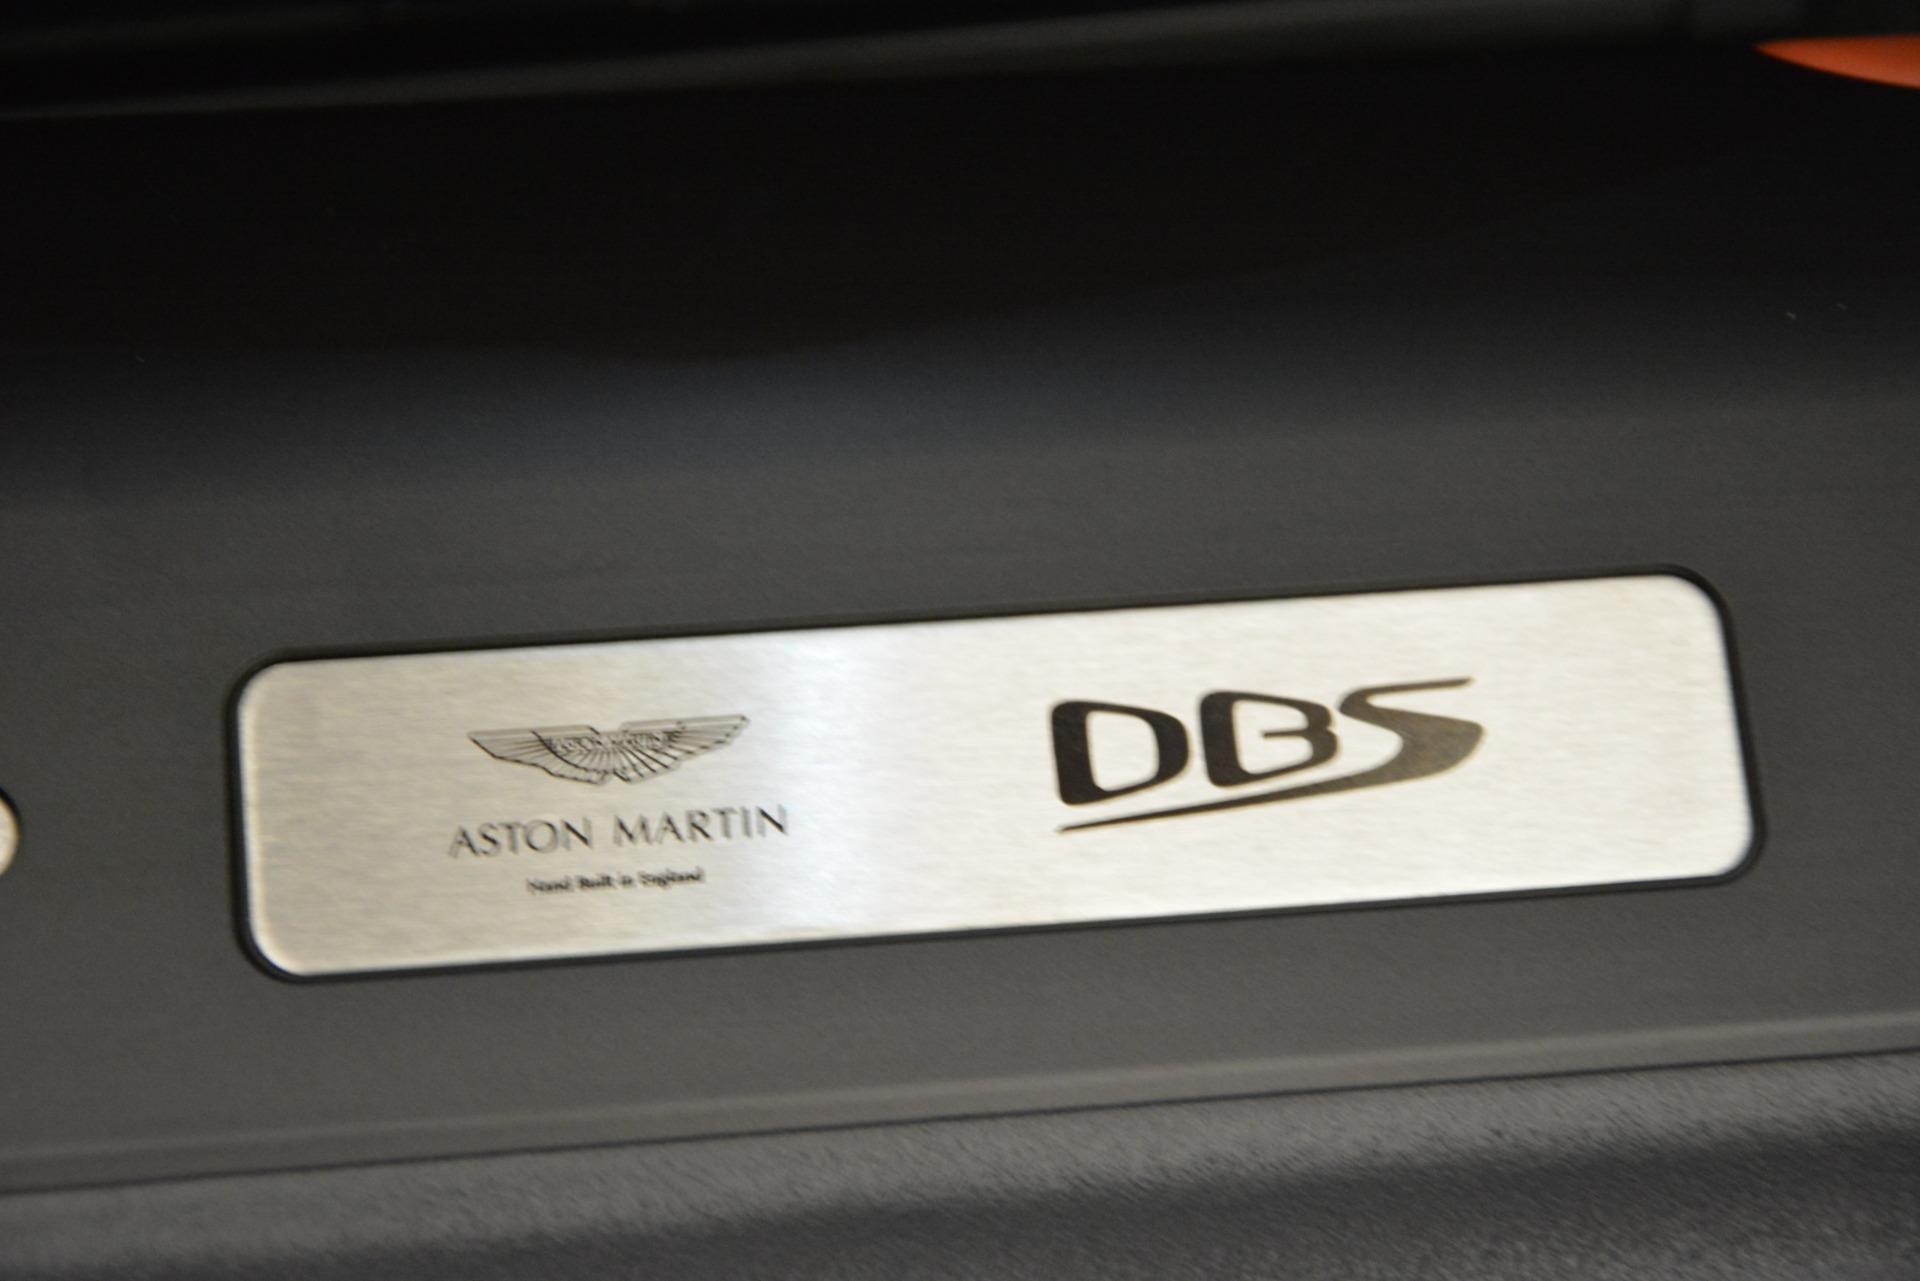 New 2019 Aston Martin DBS Superleggera For Sale In Greenwich, CT. Alfa Romeo of Greenwich, A1336 2827_p27